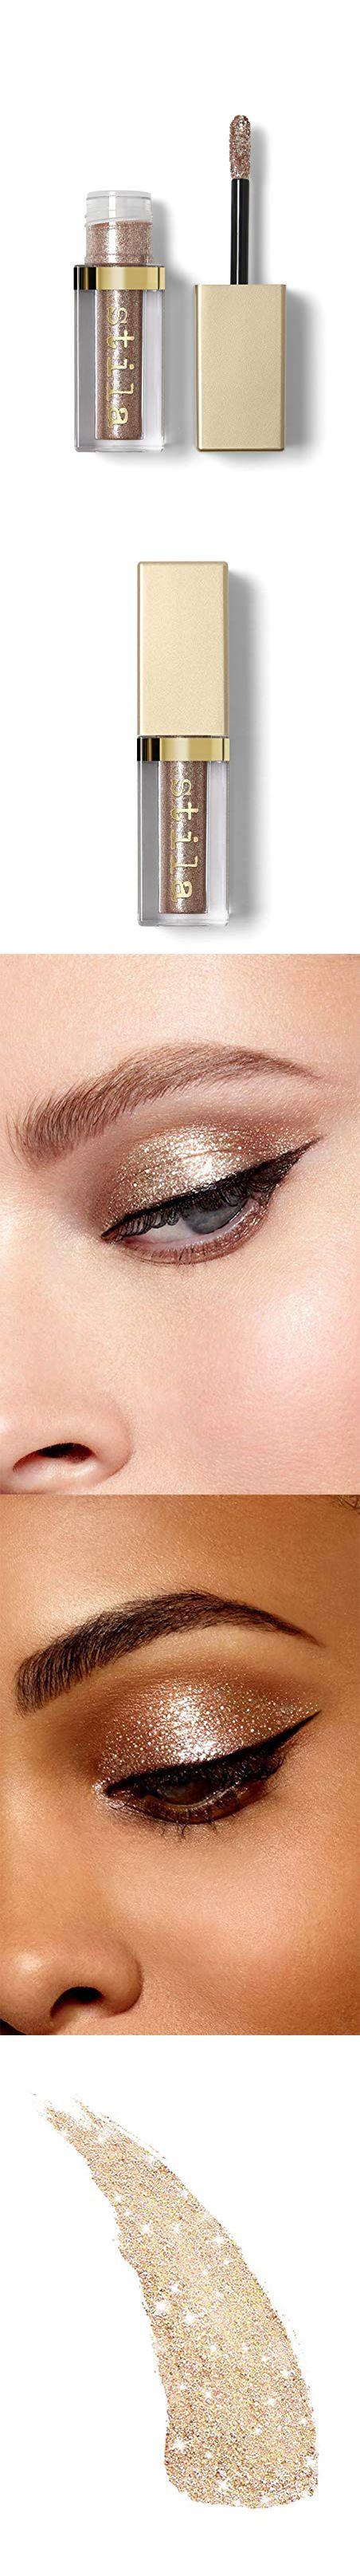 Stila Magnificent Metals Glitter Glow Liquid Eye Shadow Stila Makeup Eyeshadow Beauty Eyeshadow Stila Glitter And Glow Shadow